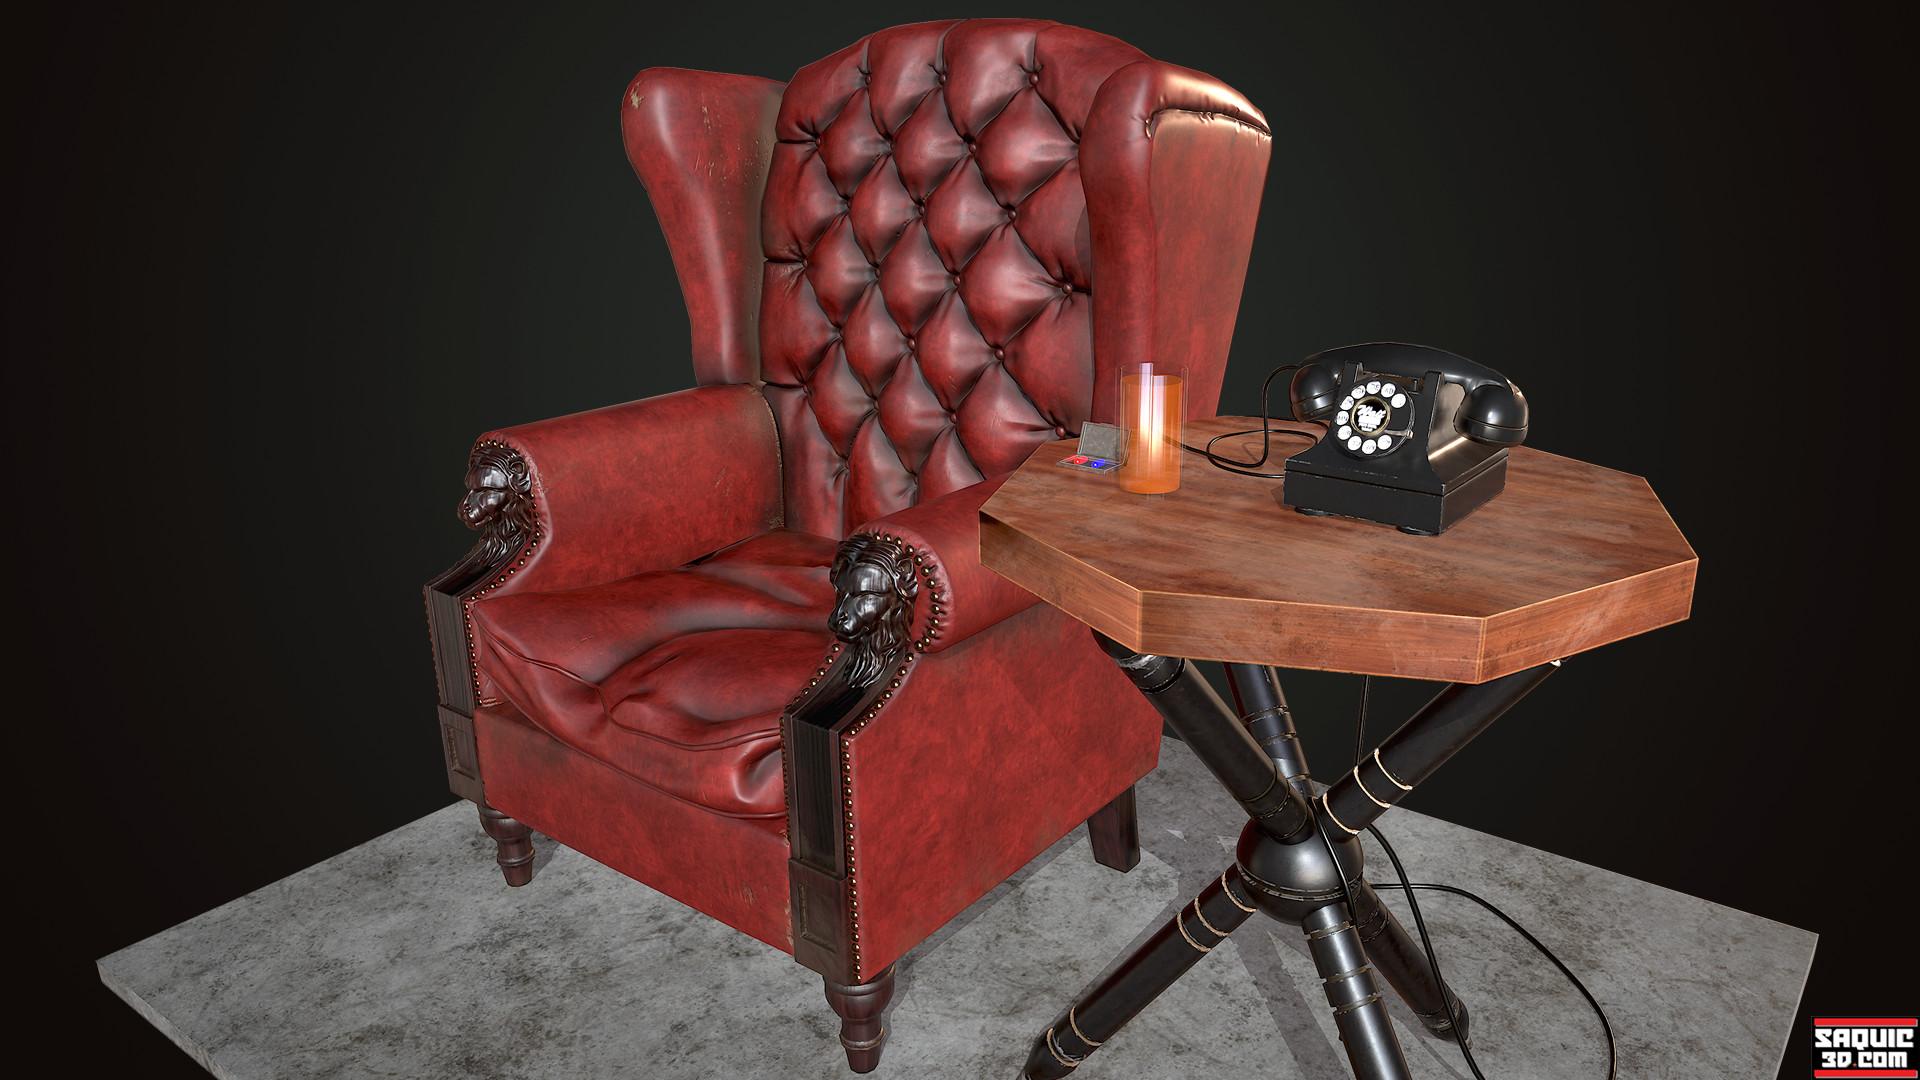 MORPHEUS CHAIR Turntable & ArtStation - Morpheus Chair Rene Saquic